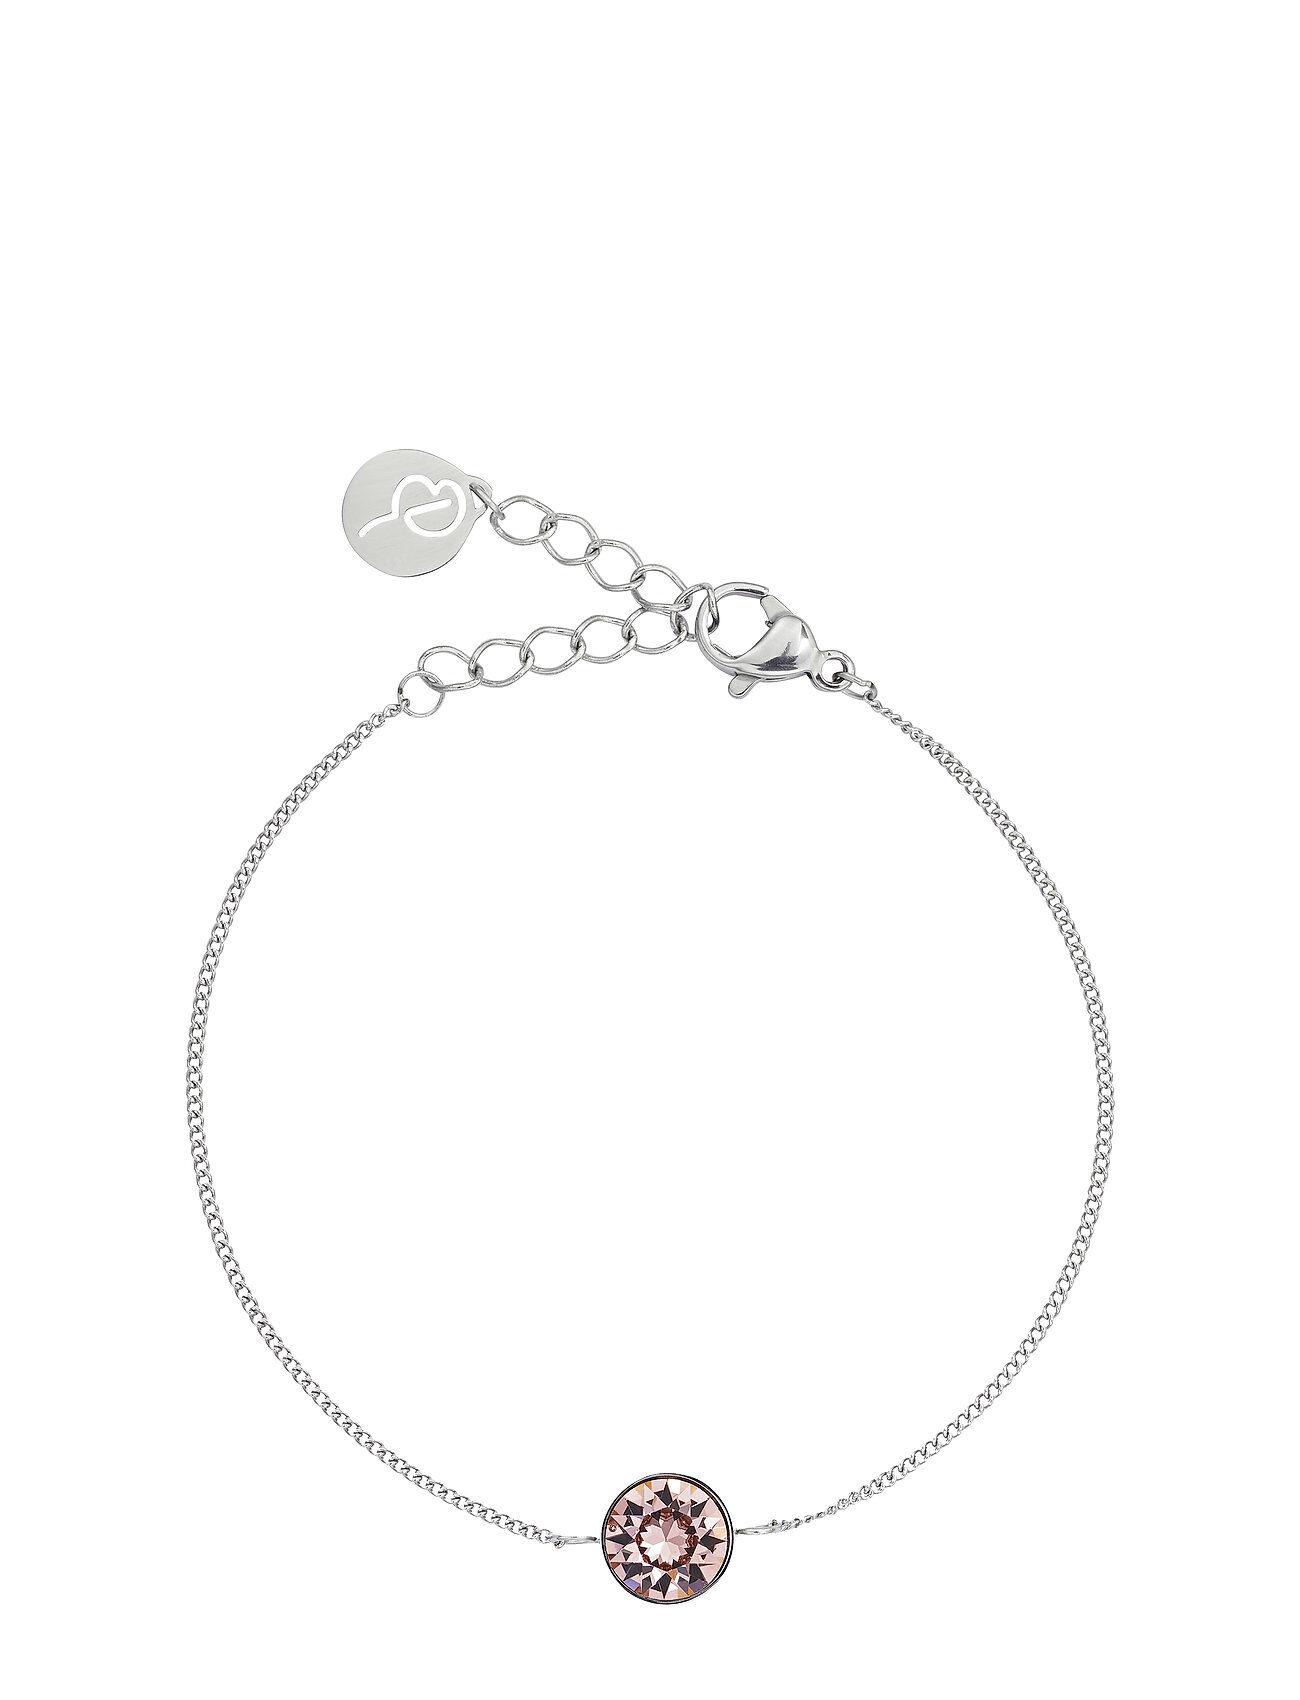 Edblad Diana Bracelet Bubble Gum Crystal Steel Accessories Jewellery Bracelets Chain Bracelets Hopea Edblad